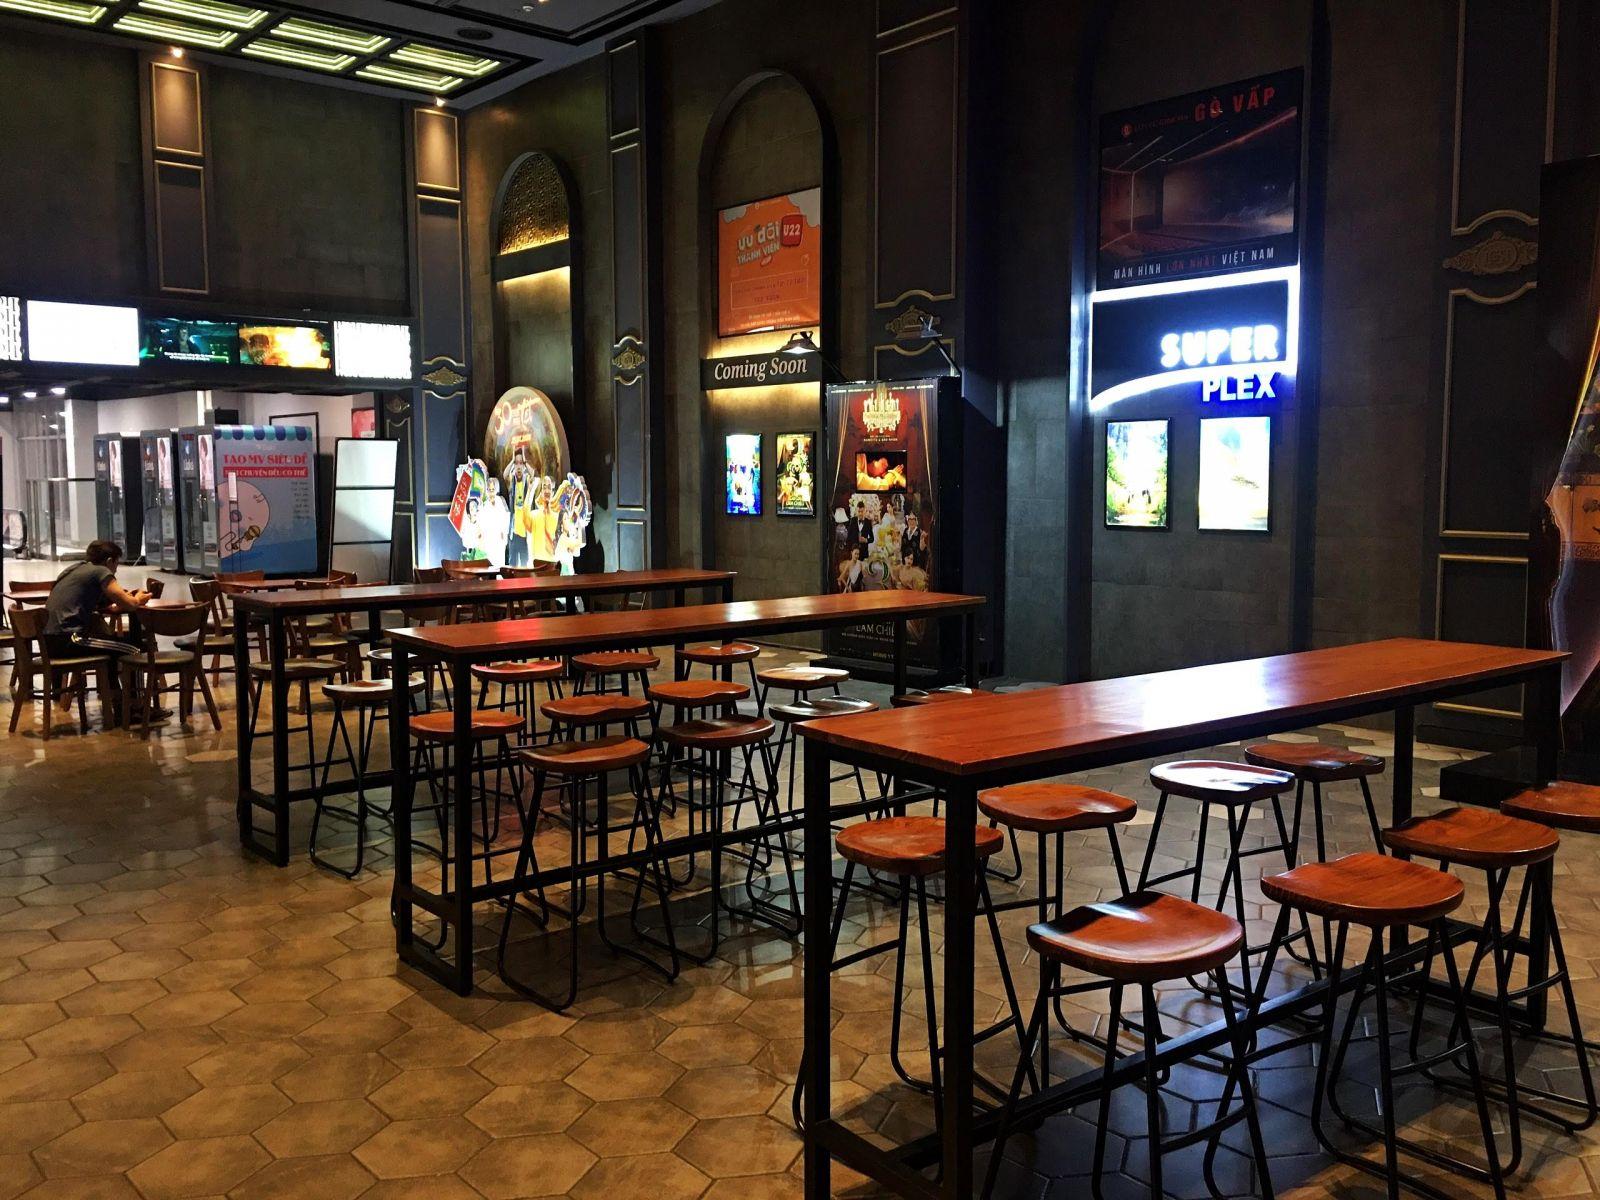 mẫu bàn ghế bar vintage tại lotte cinema